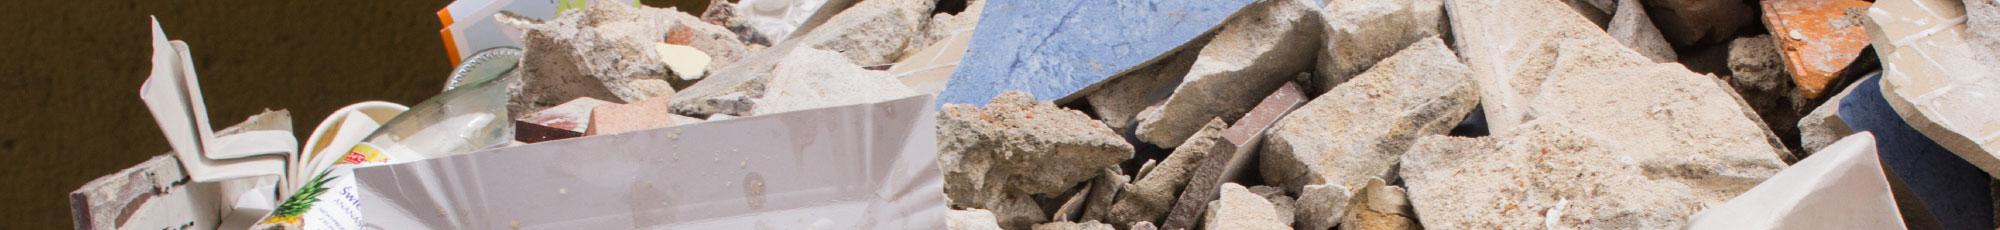 bauschutt-baurestmassen-container-mulde-entsorgen